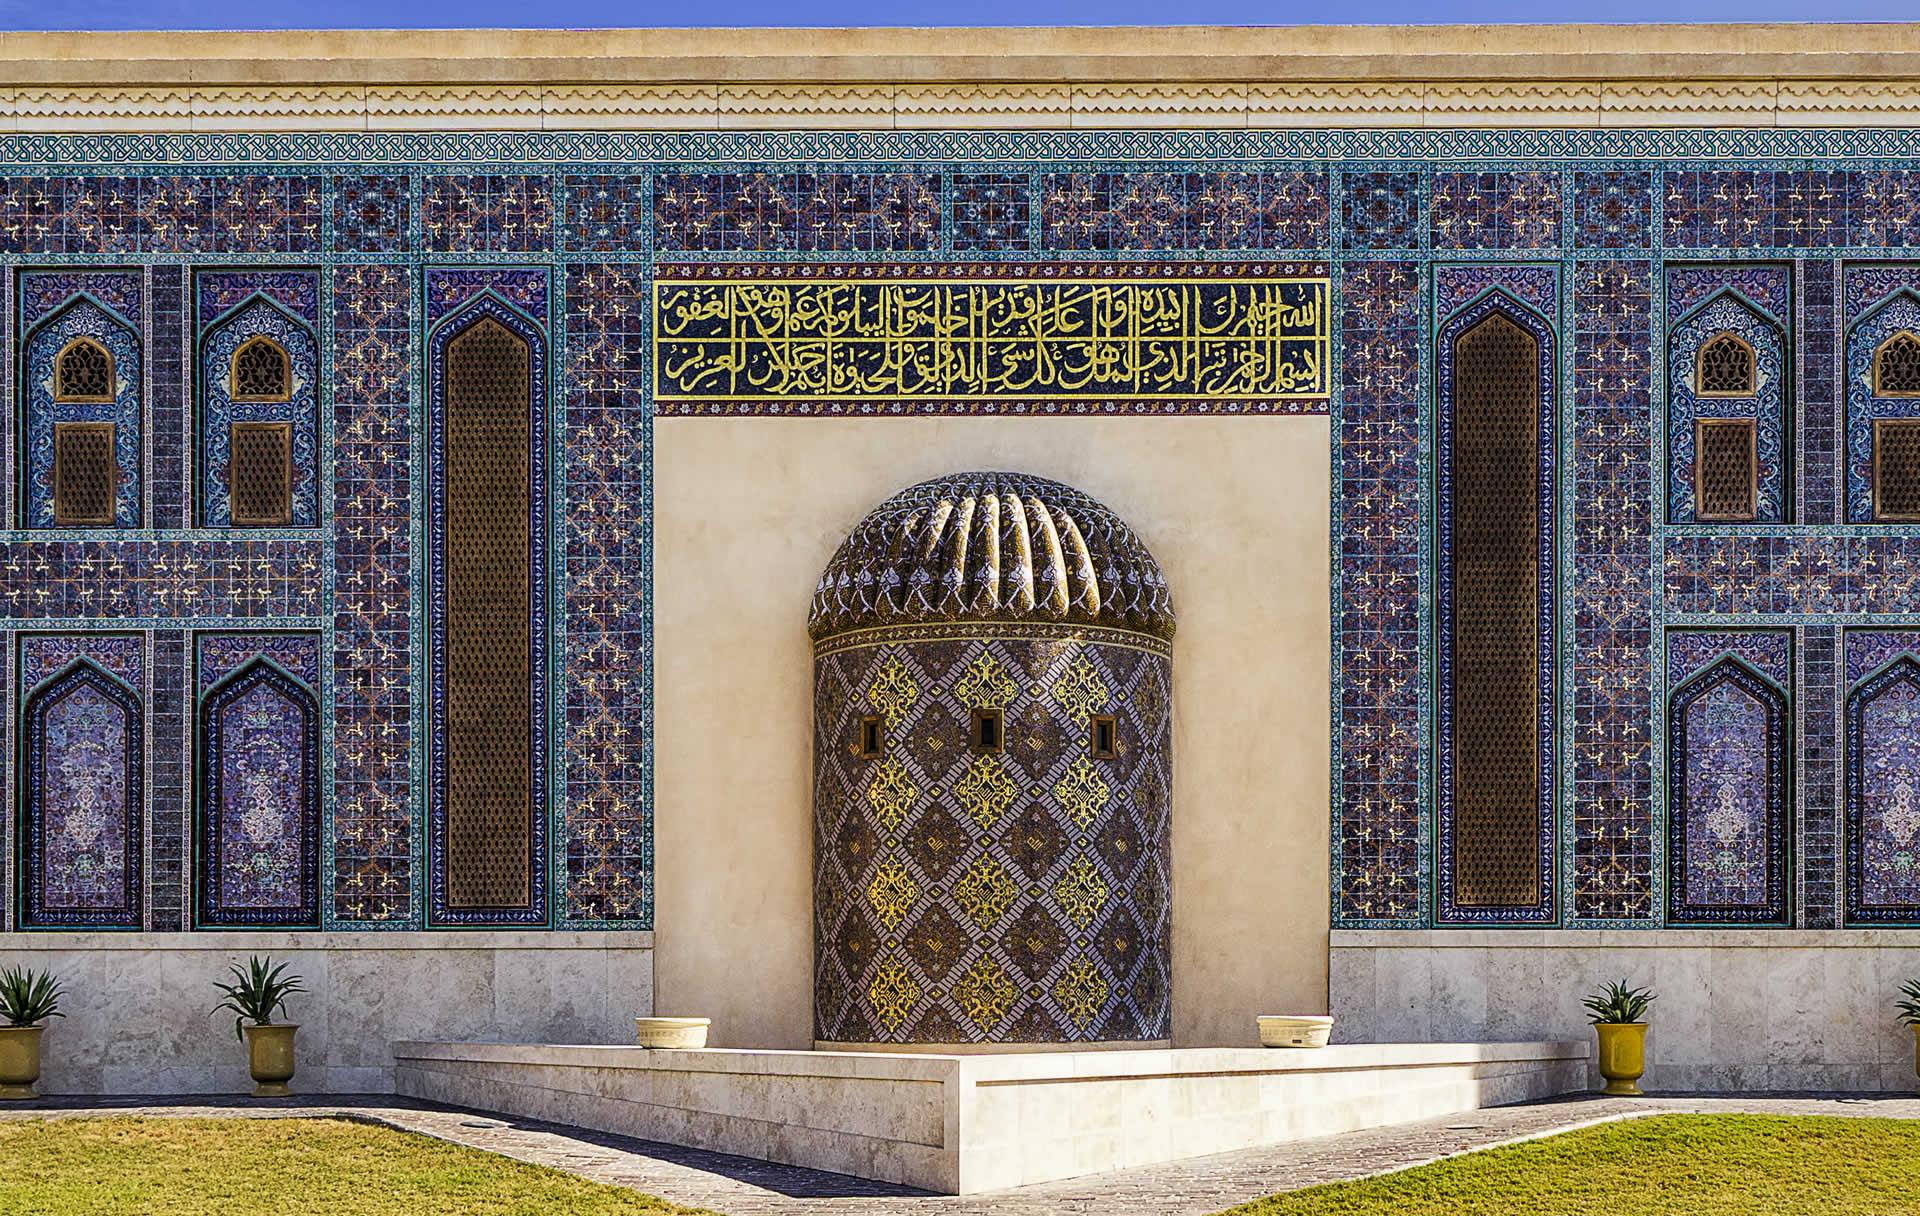 Mosque in Qatar